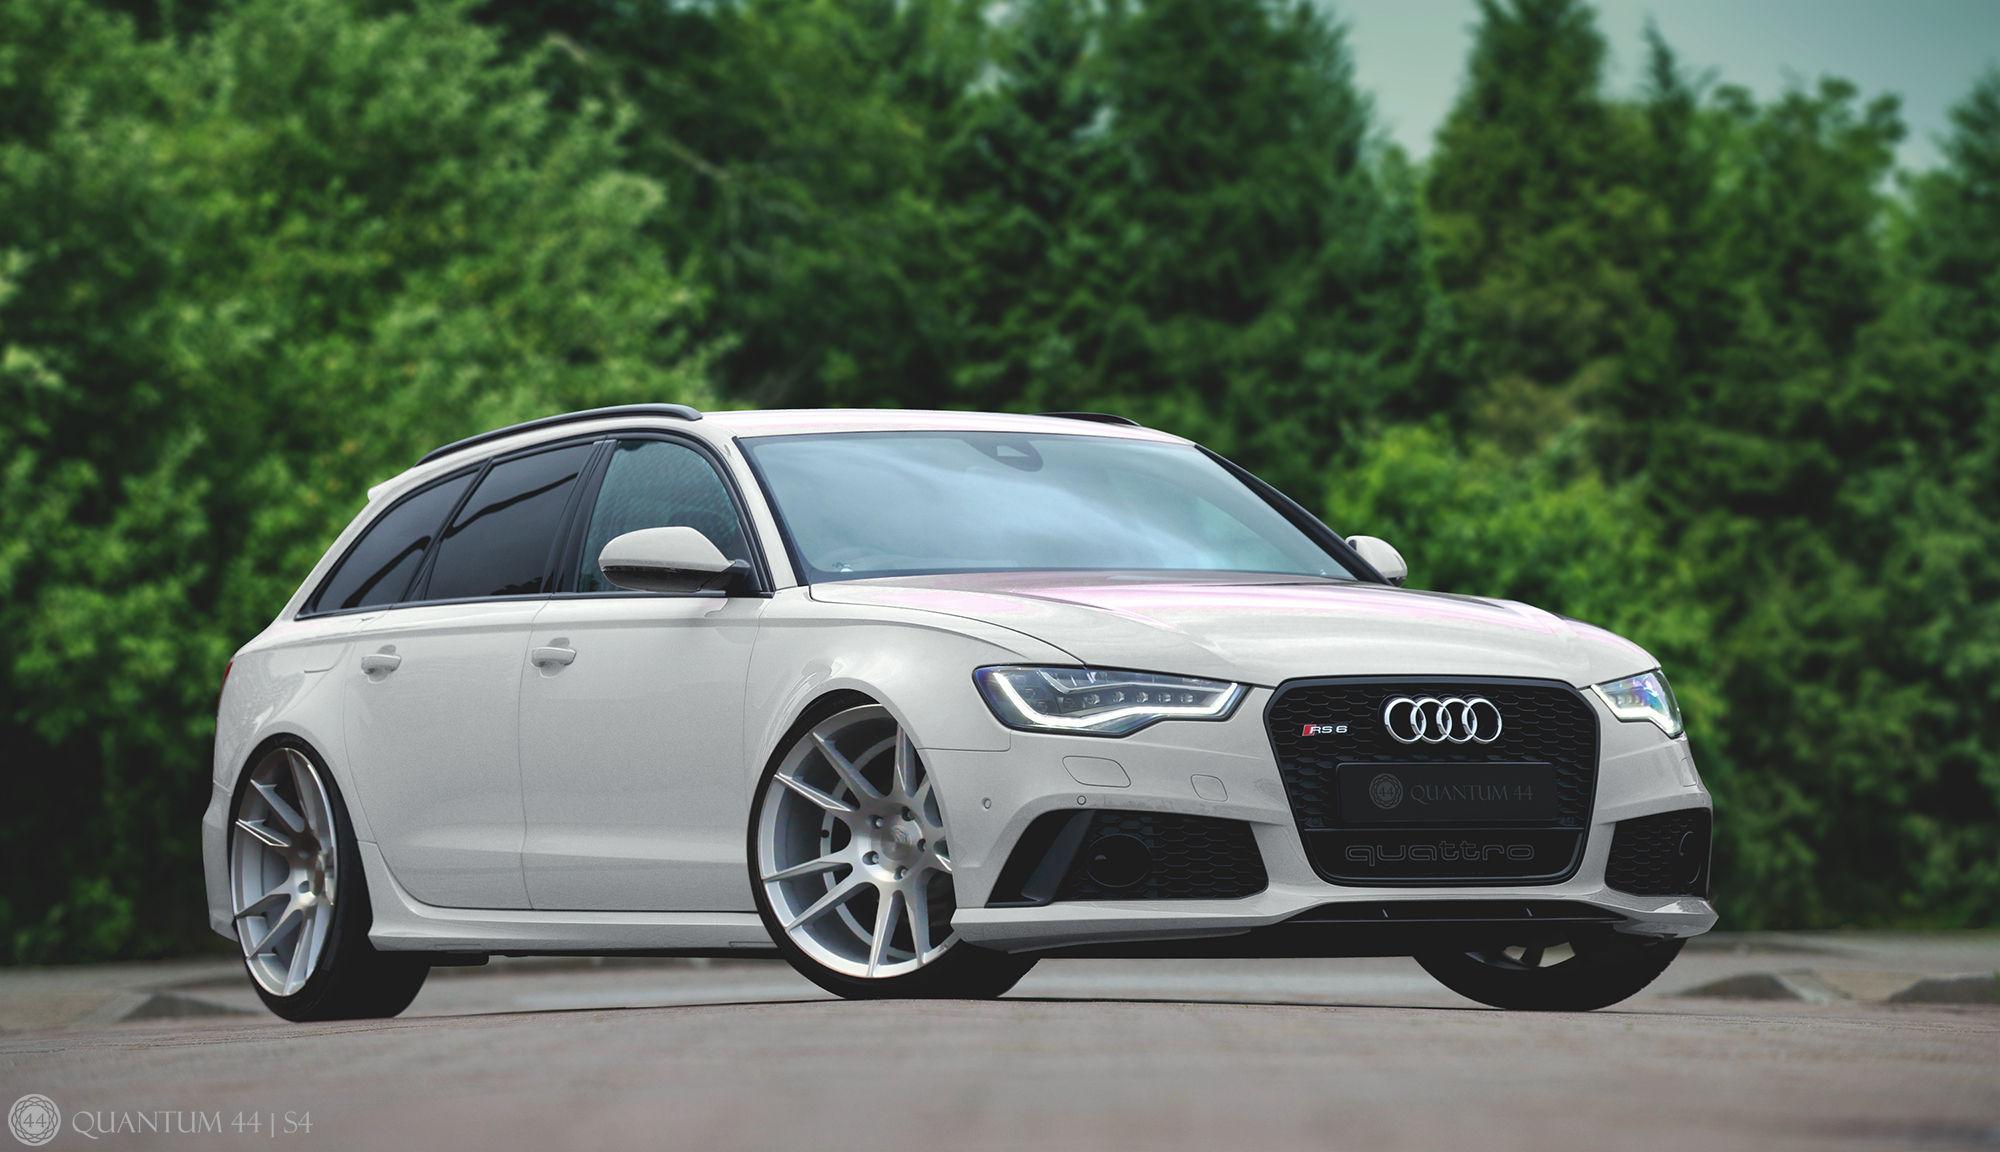 Audi RS 6 | Quantum44 S4 - Audi RS6